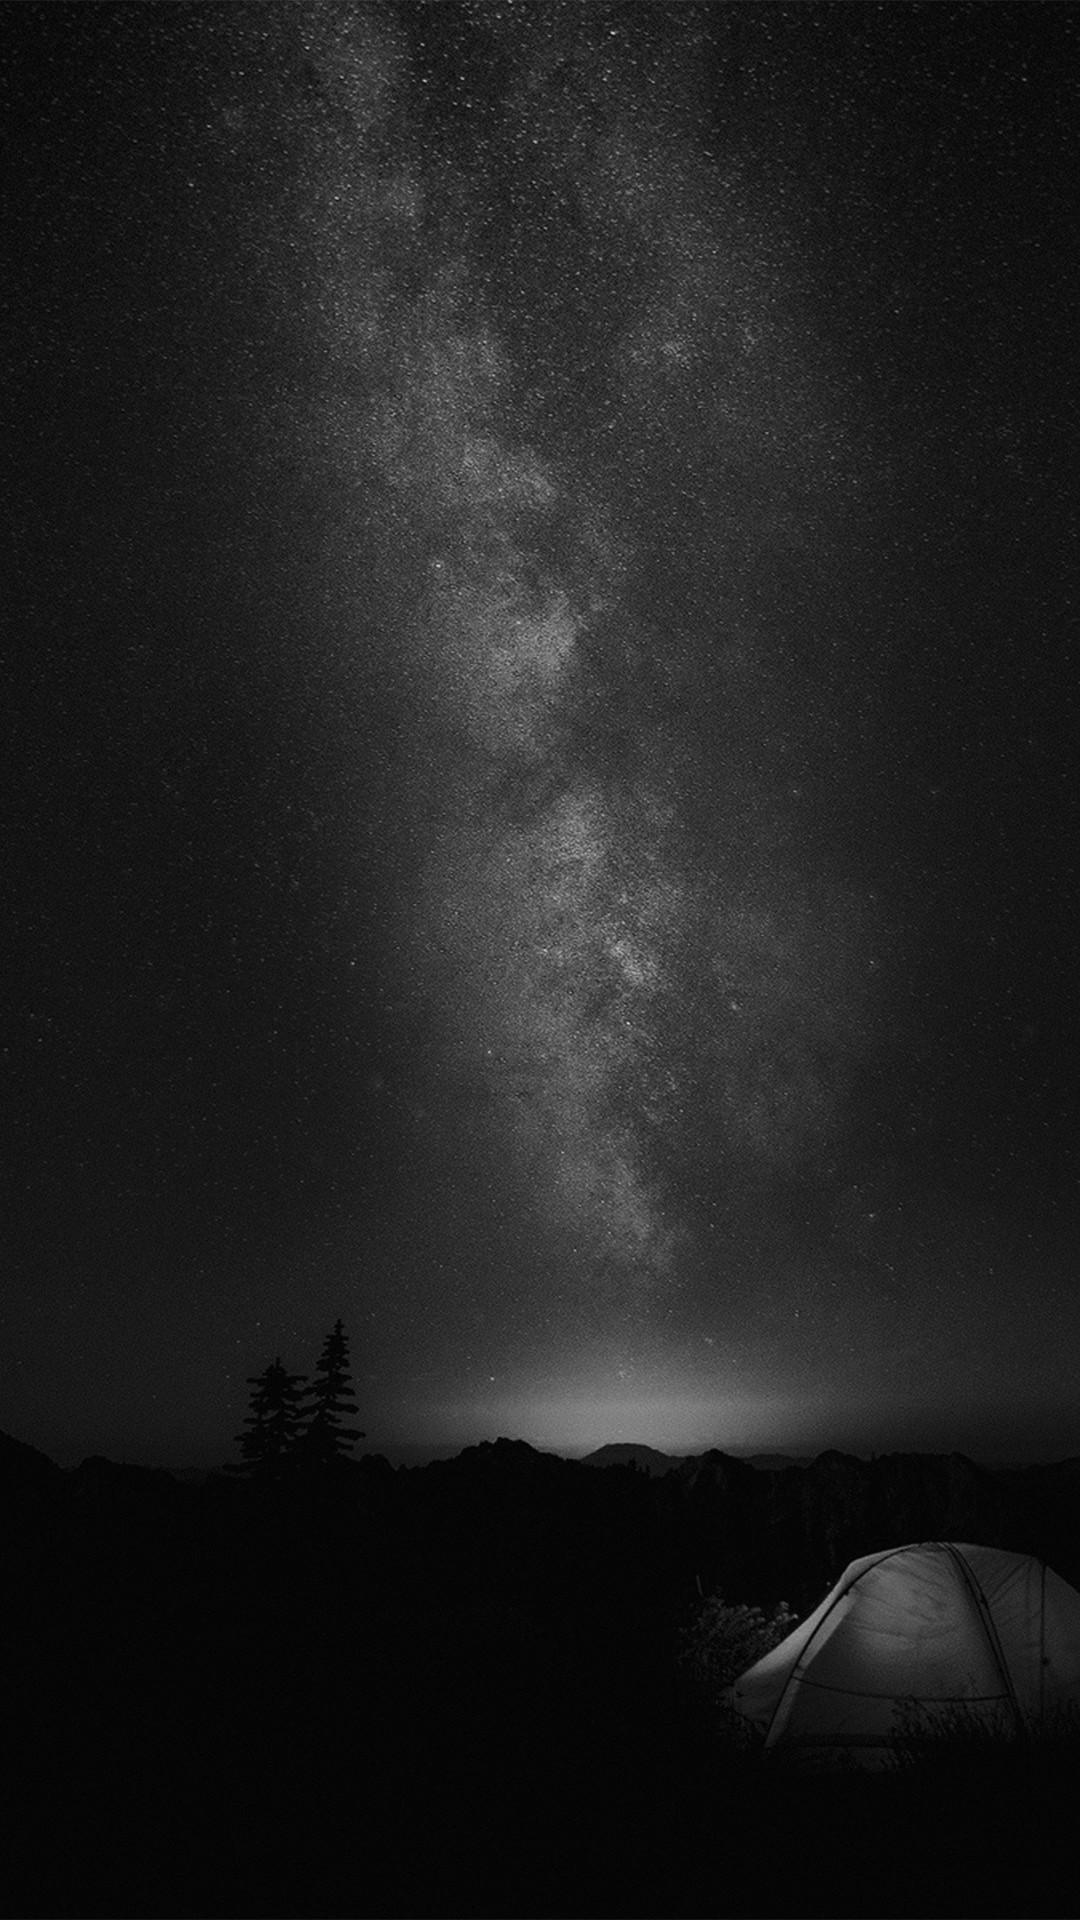 Camping Night Star Galaxy Milky Sky Dark Space Bw iPhone 8 wallpaper